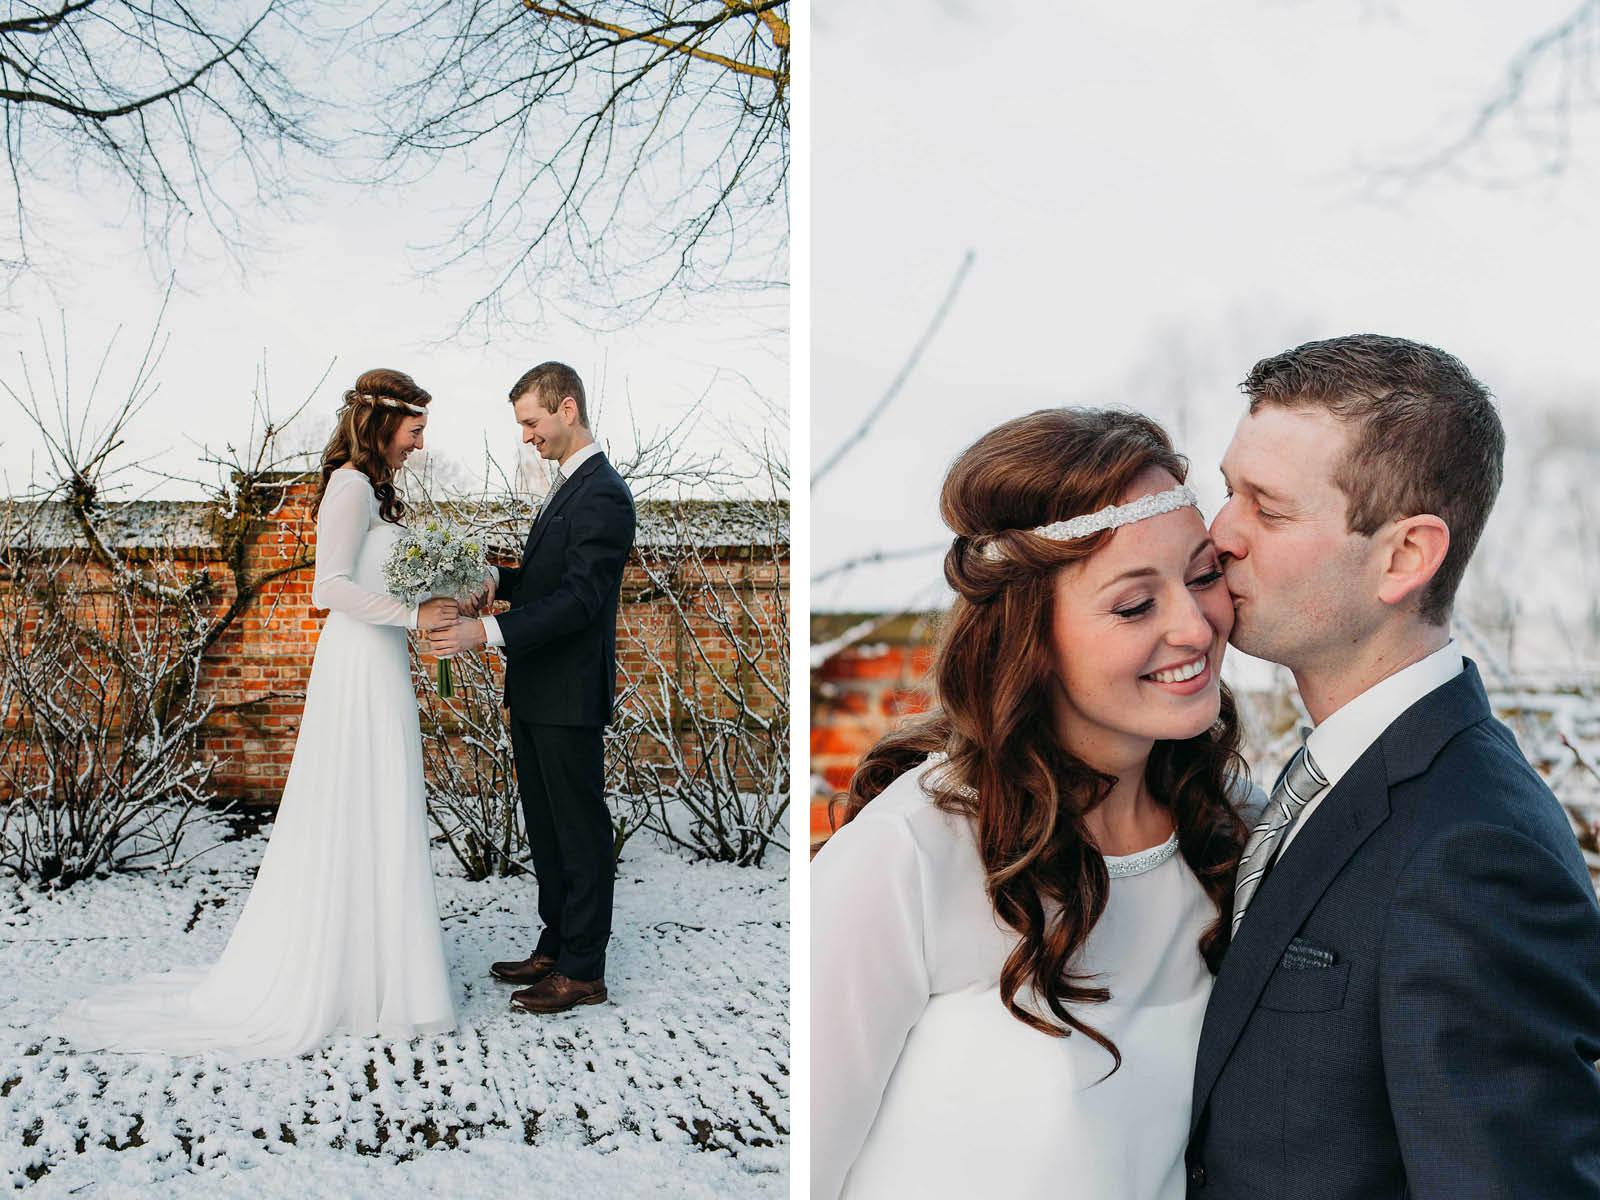 Evabloemweddings_bruidsfotografie_winterbruiloft_031.jpg